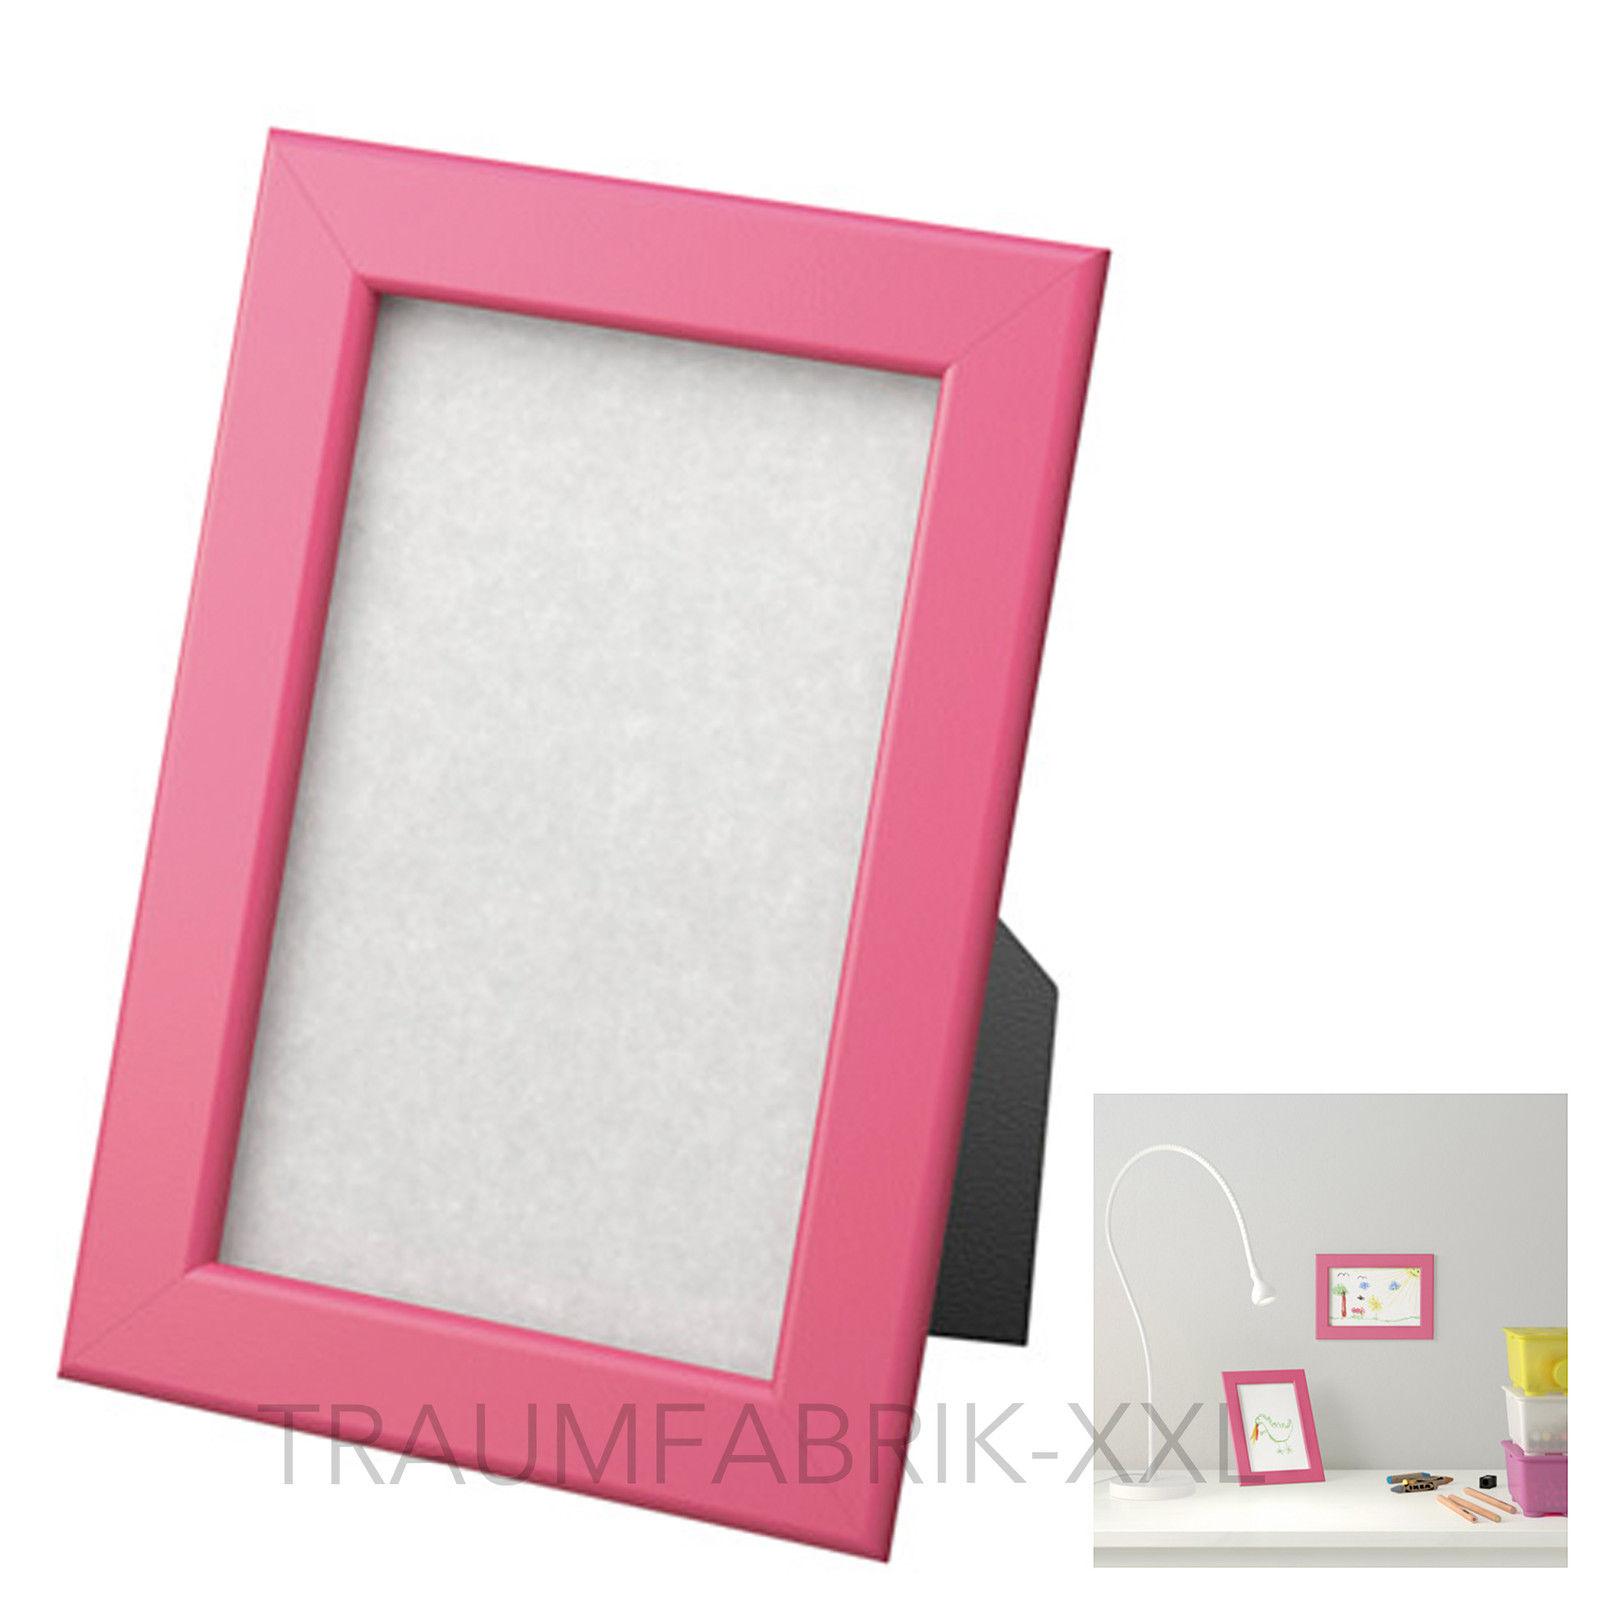 ikea fiskbo rahmen in rosa pink 10 15 cm bilderrahmen. Black Bedroom Furniture Sets. Home Design Ideas